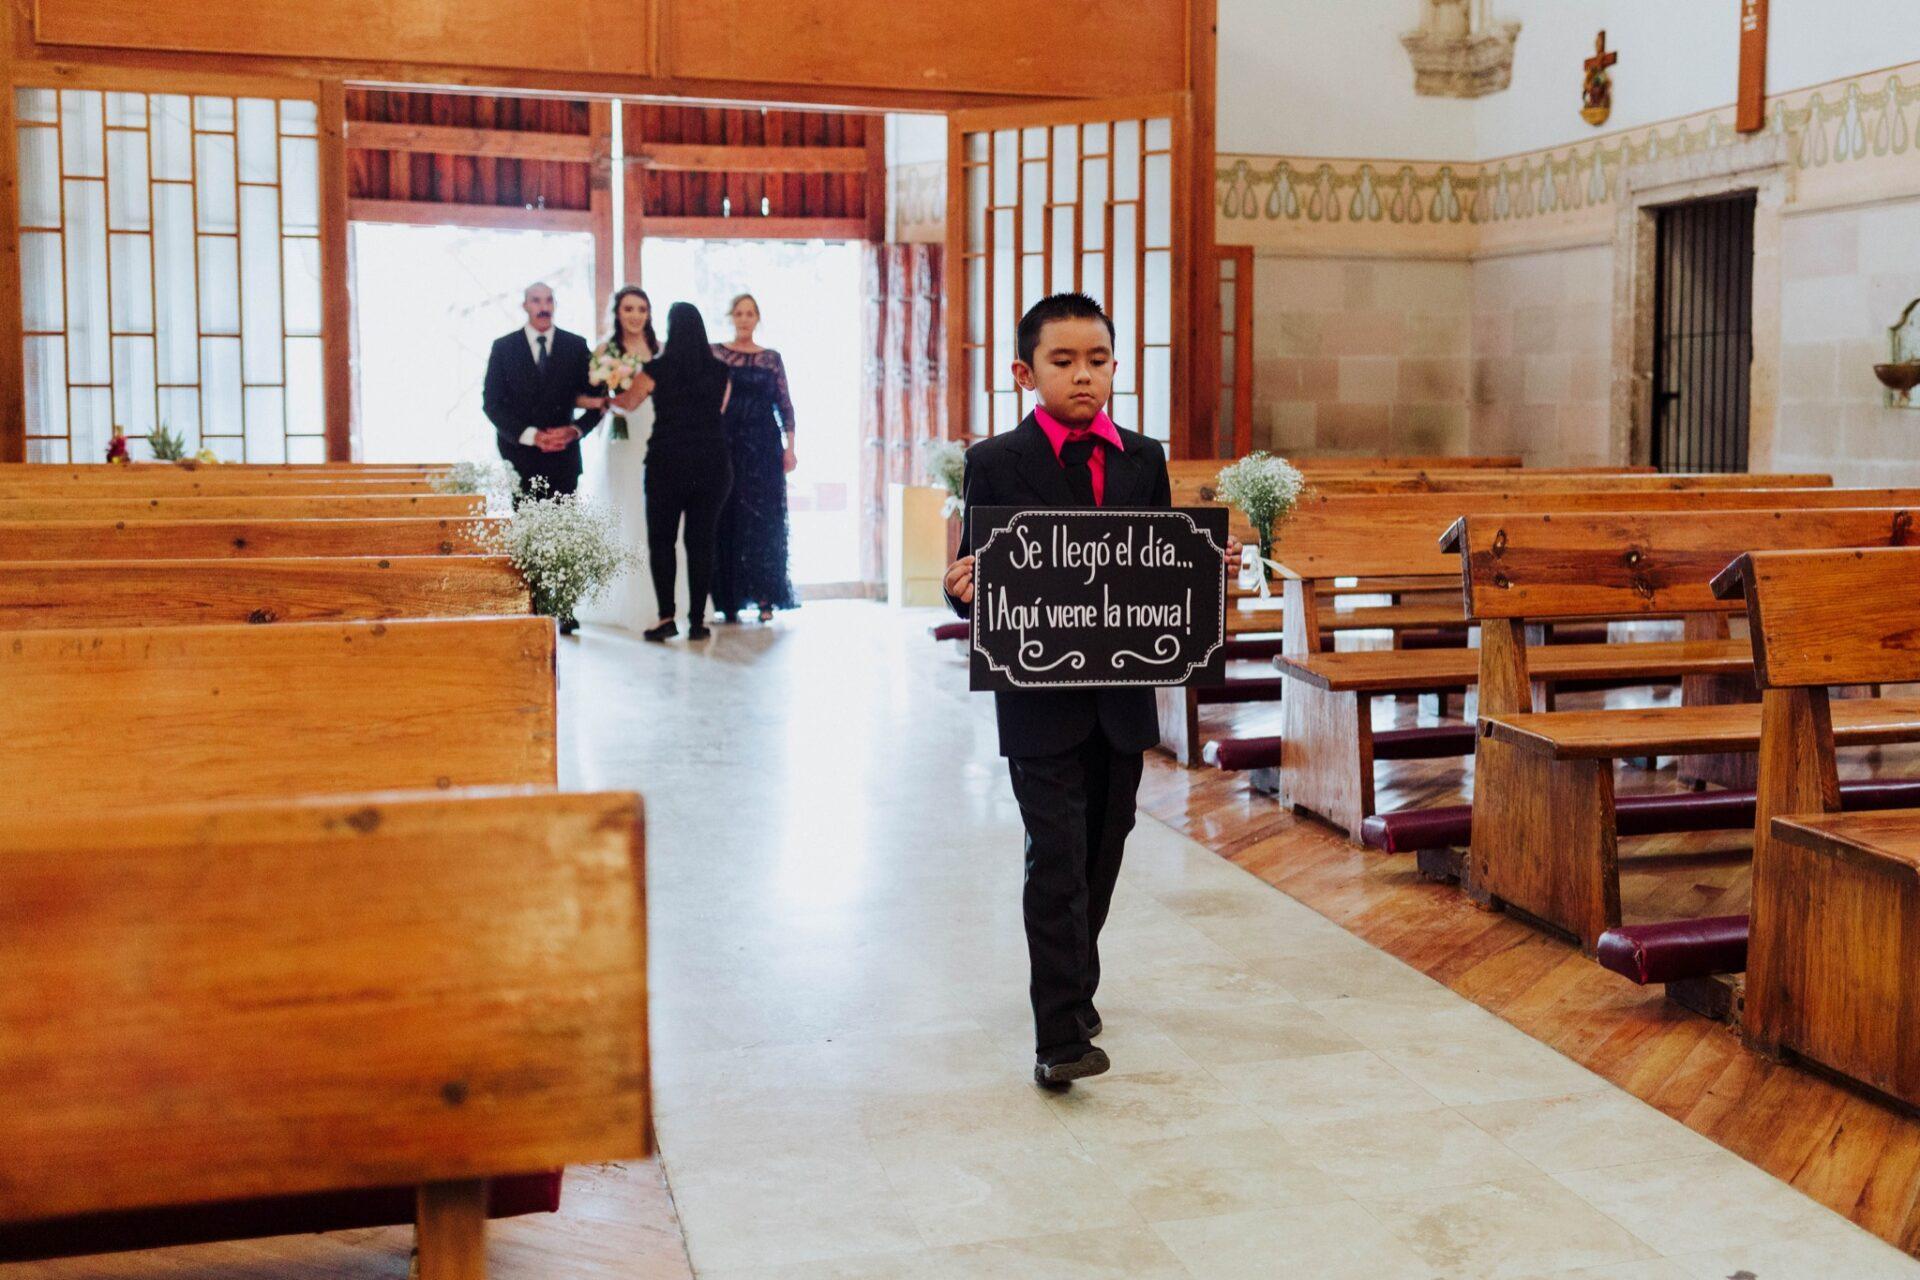 javier_noriega_fotografo_bodas_teul_zacatecas_wedding_photographer8a